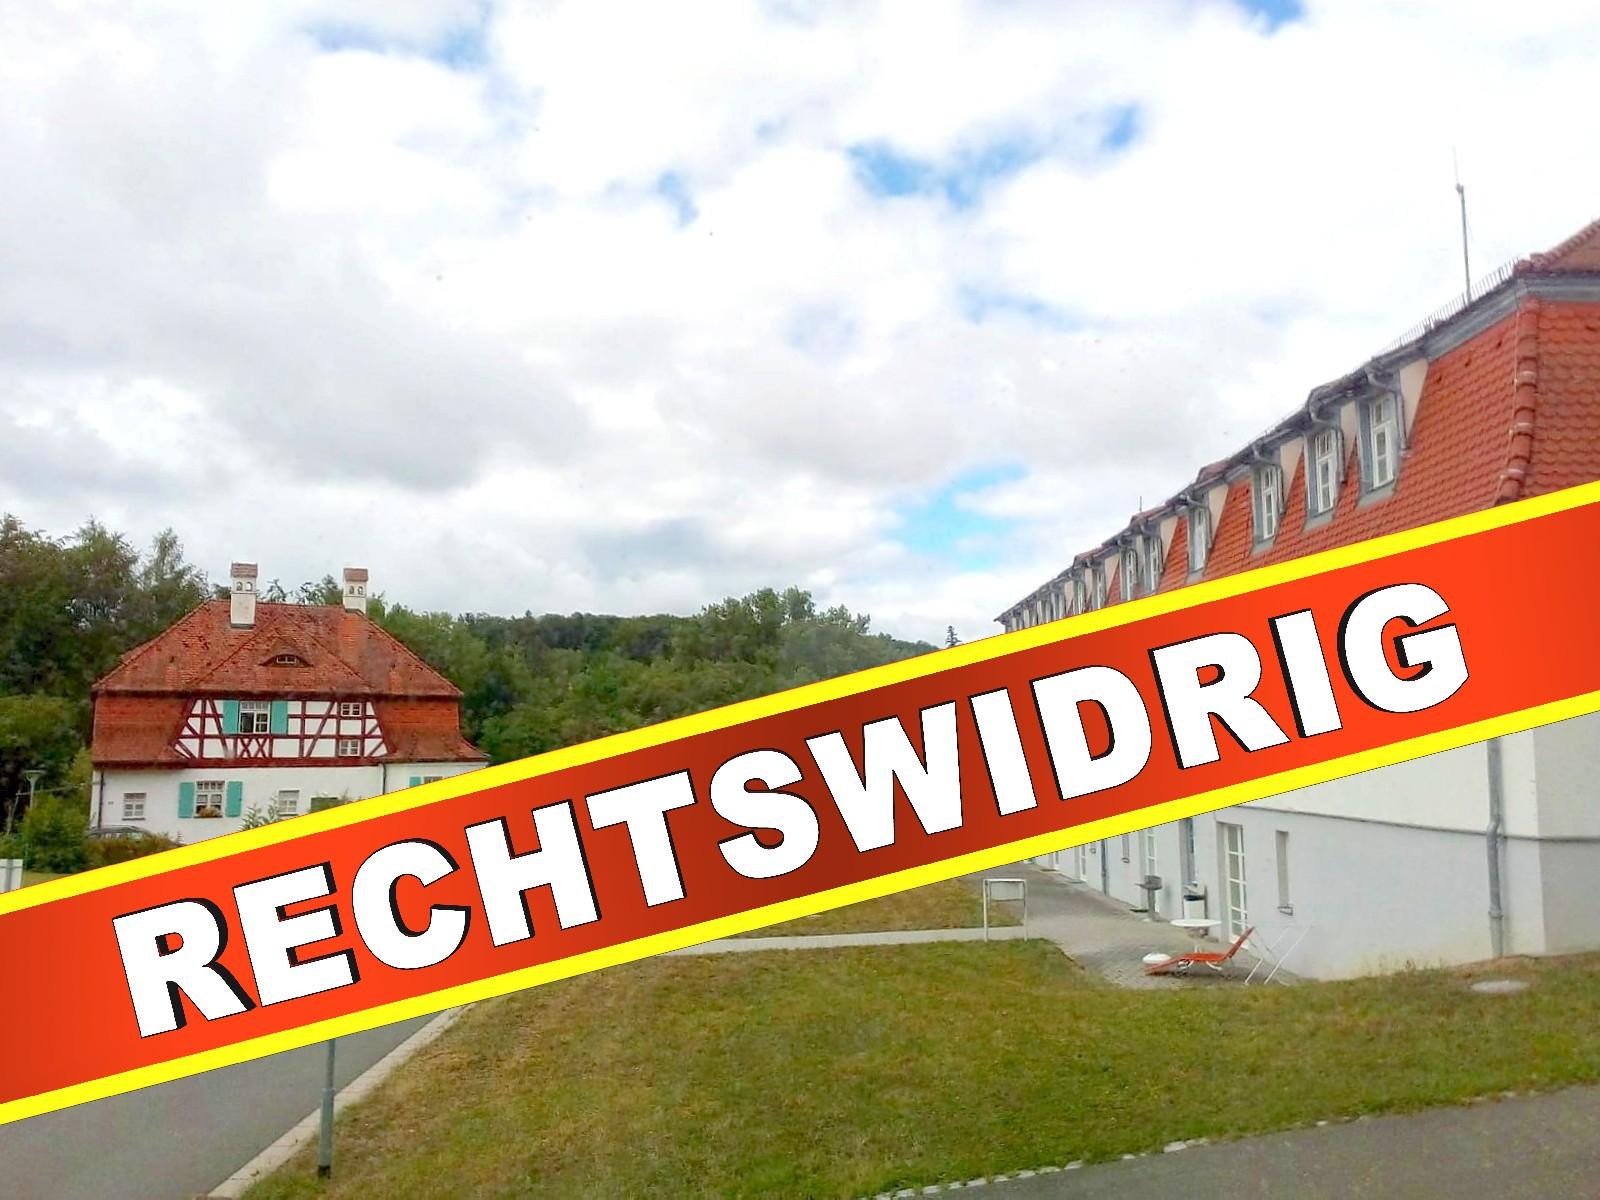 Bezirksklinikum Obermain Kutzenberg, 96250 Ebensfeld Psychiatrie Polizei Krankenhaus (34)